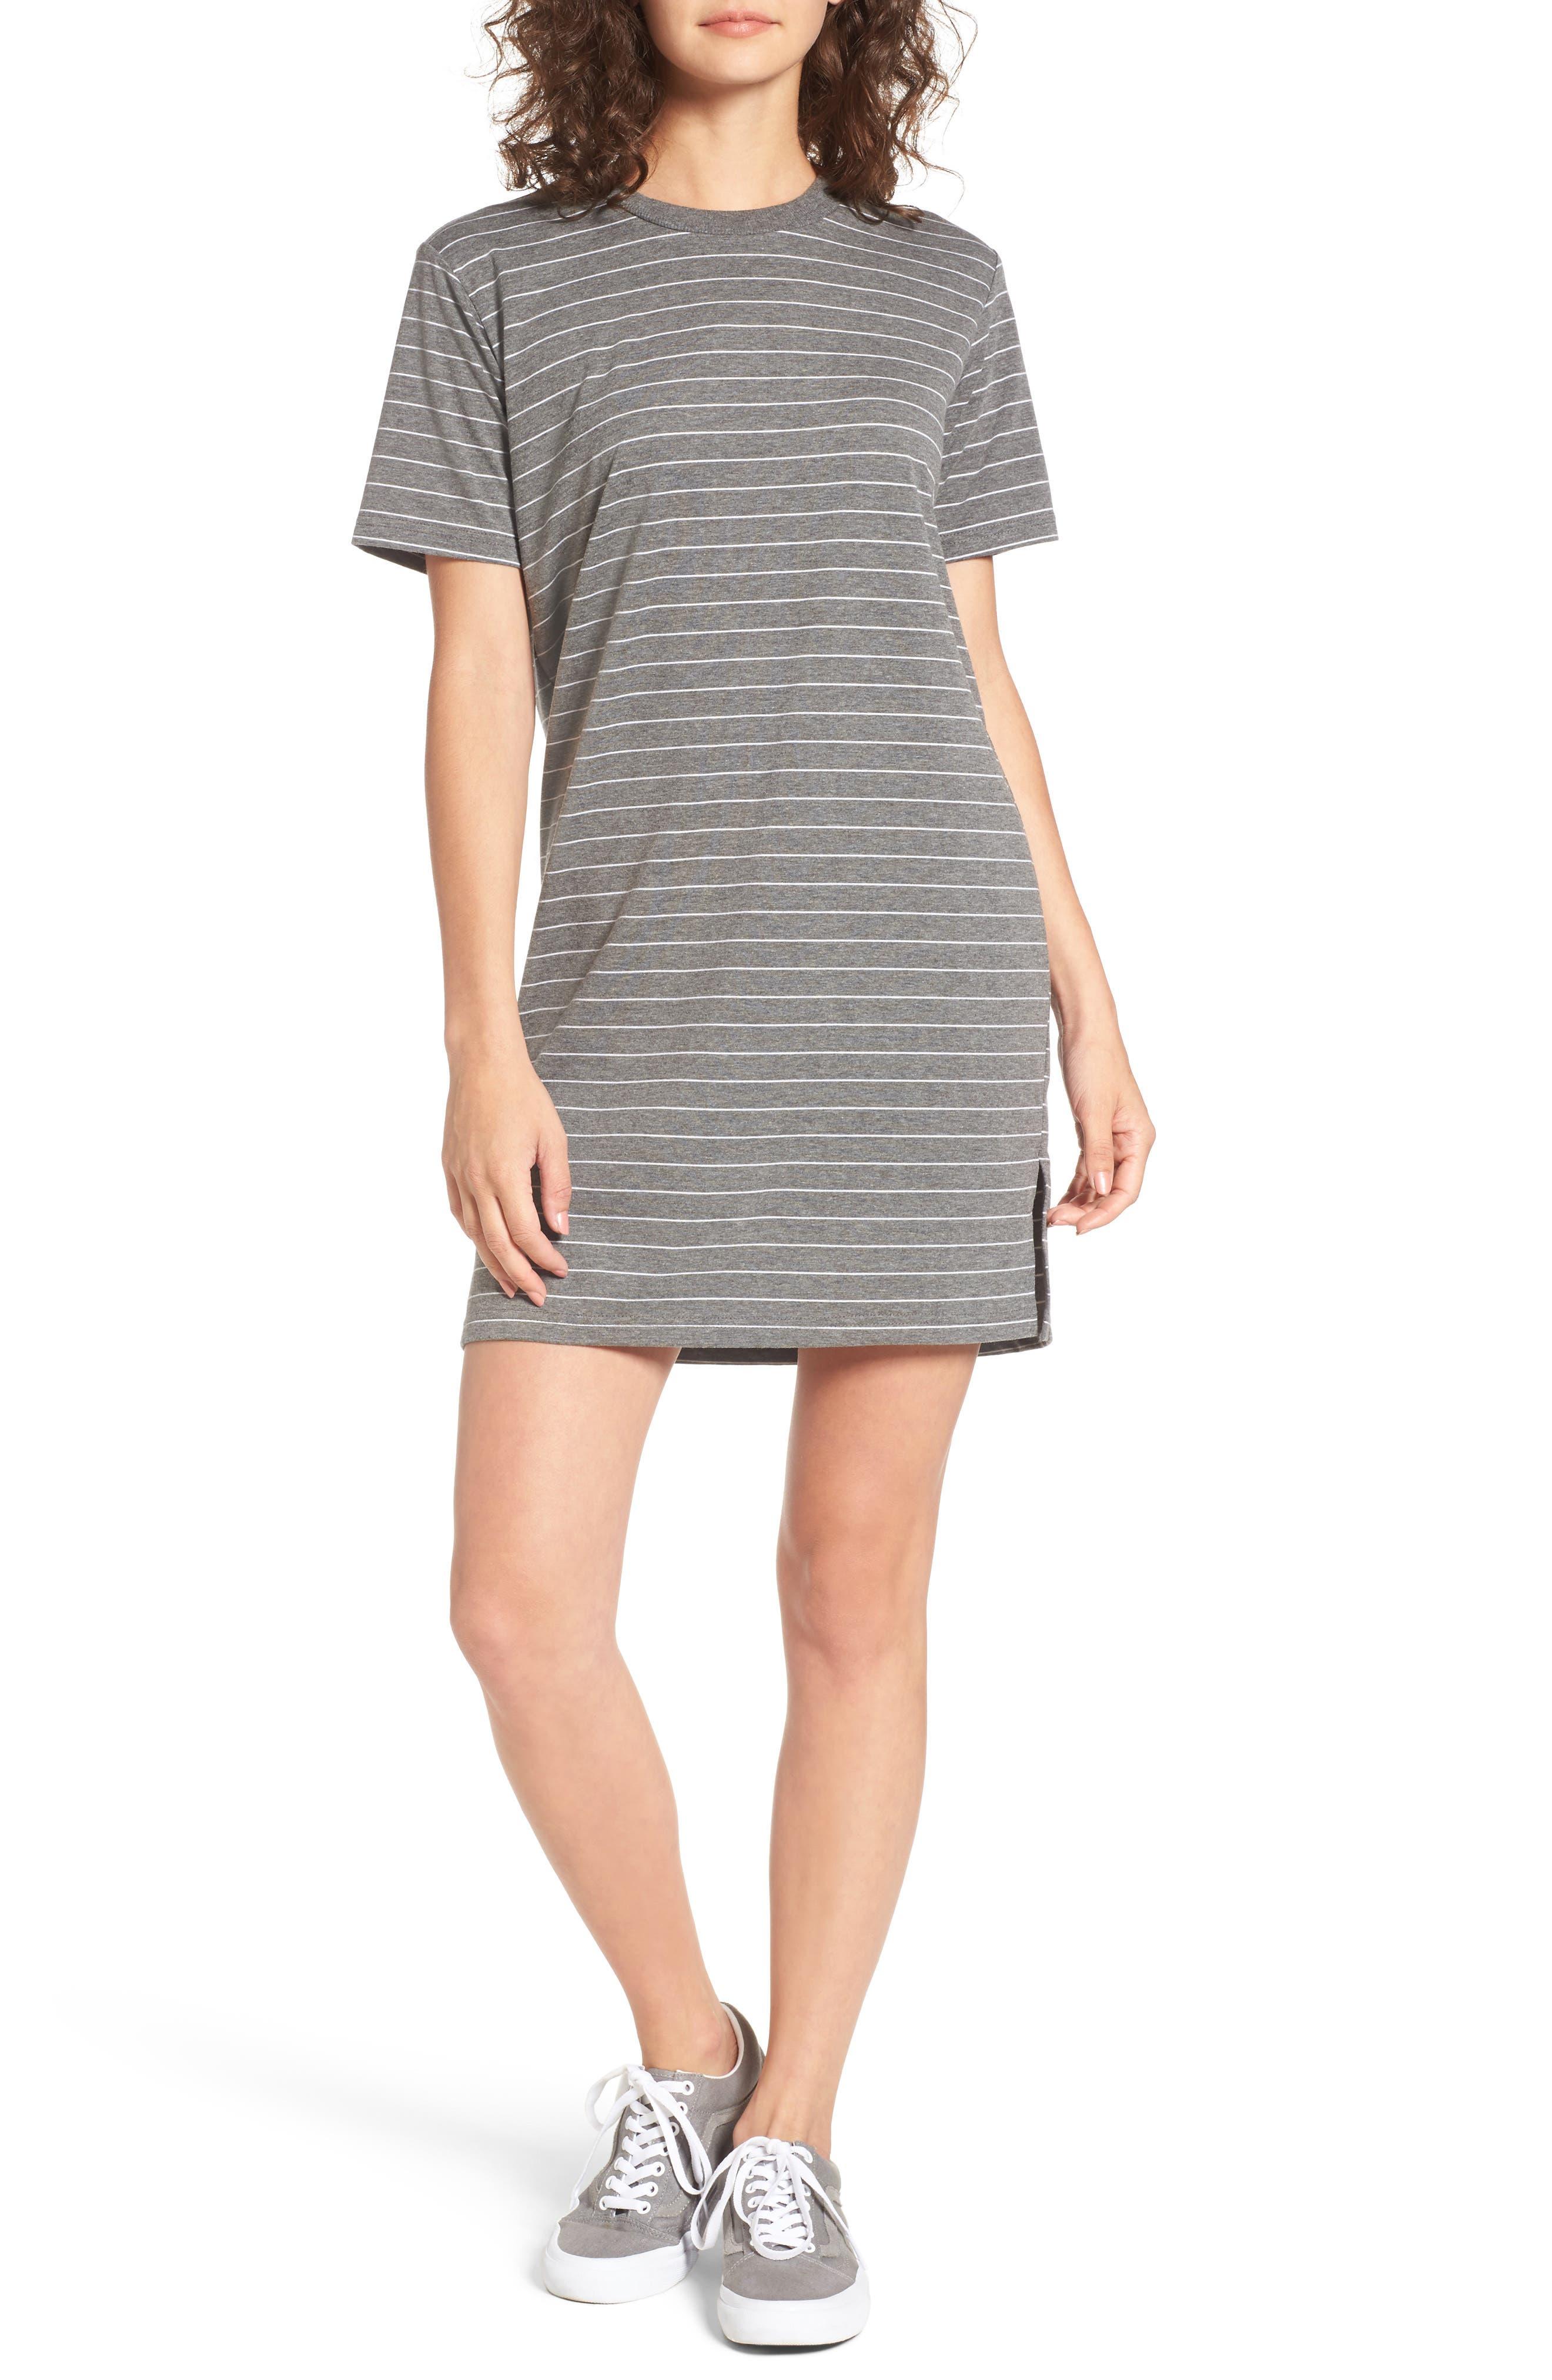 Cotton Emporium Stripe T-Shirt Dress